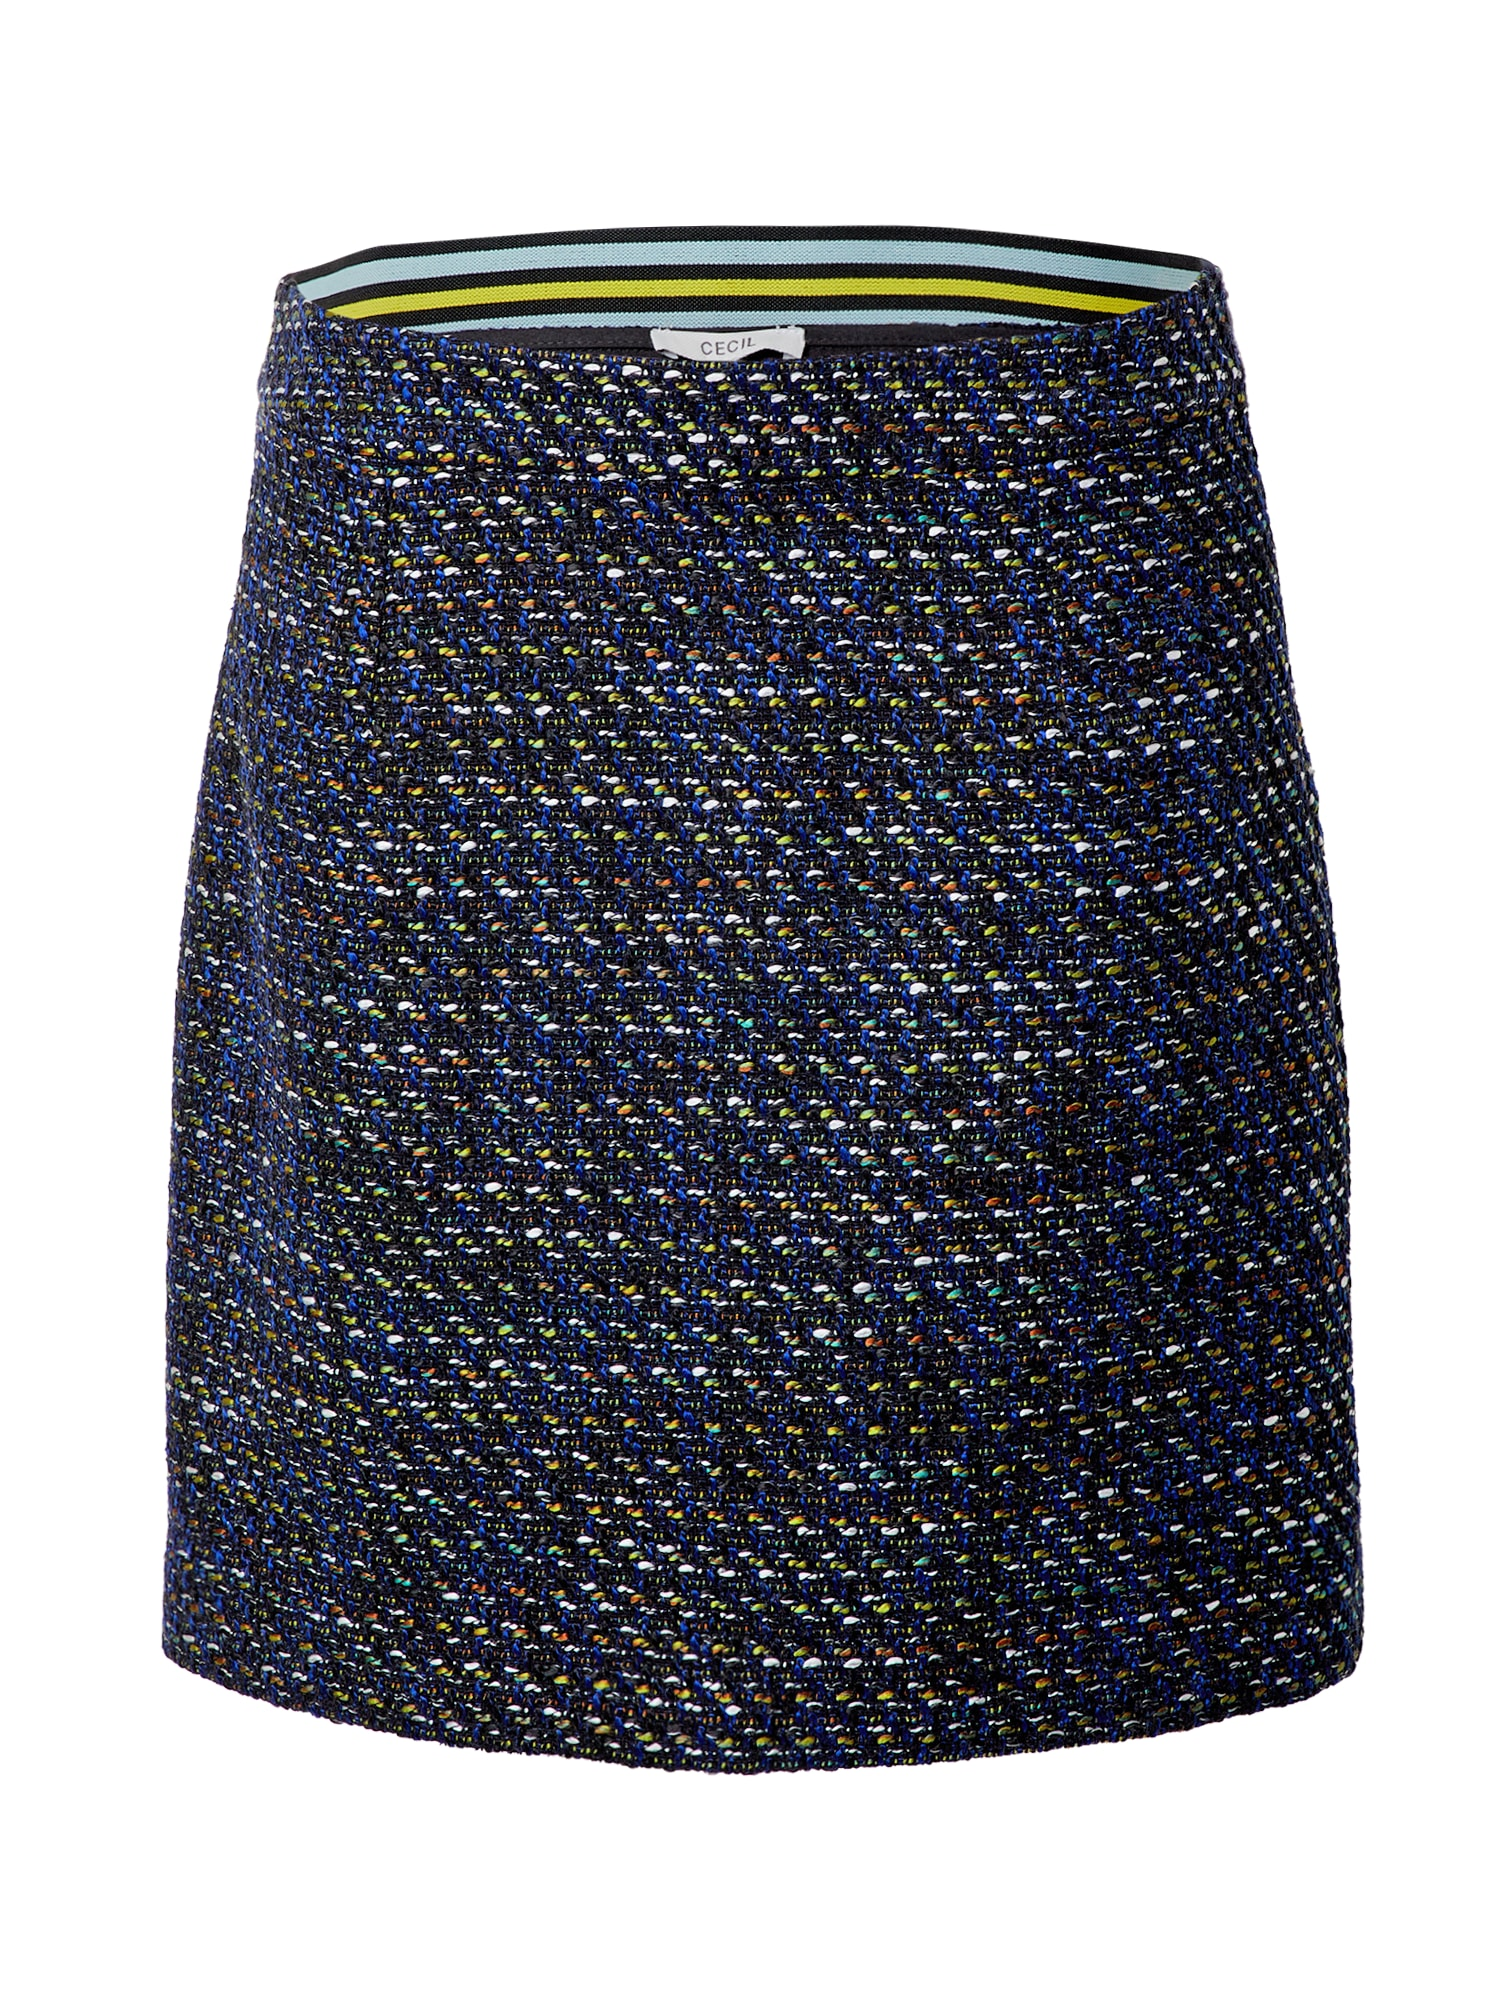 CECIL Sijonas juoda / mėlyna / geltona / balta